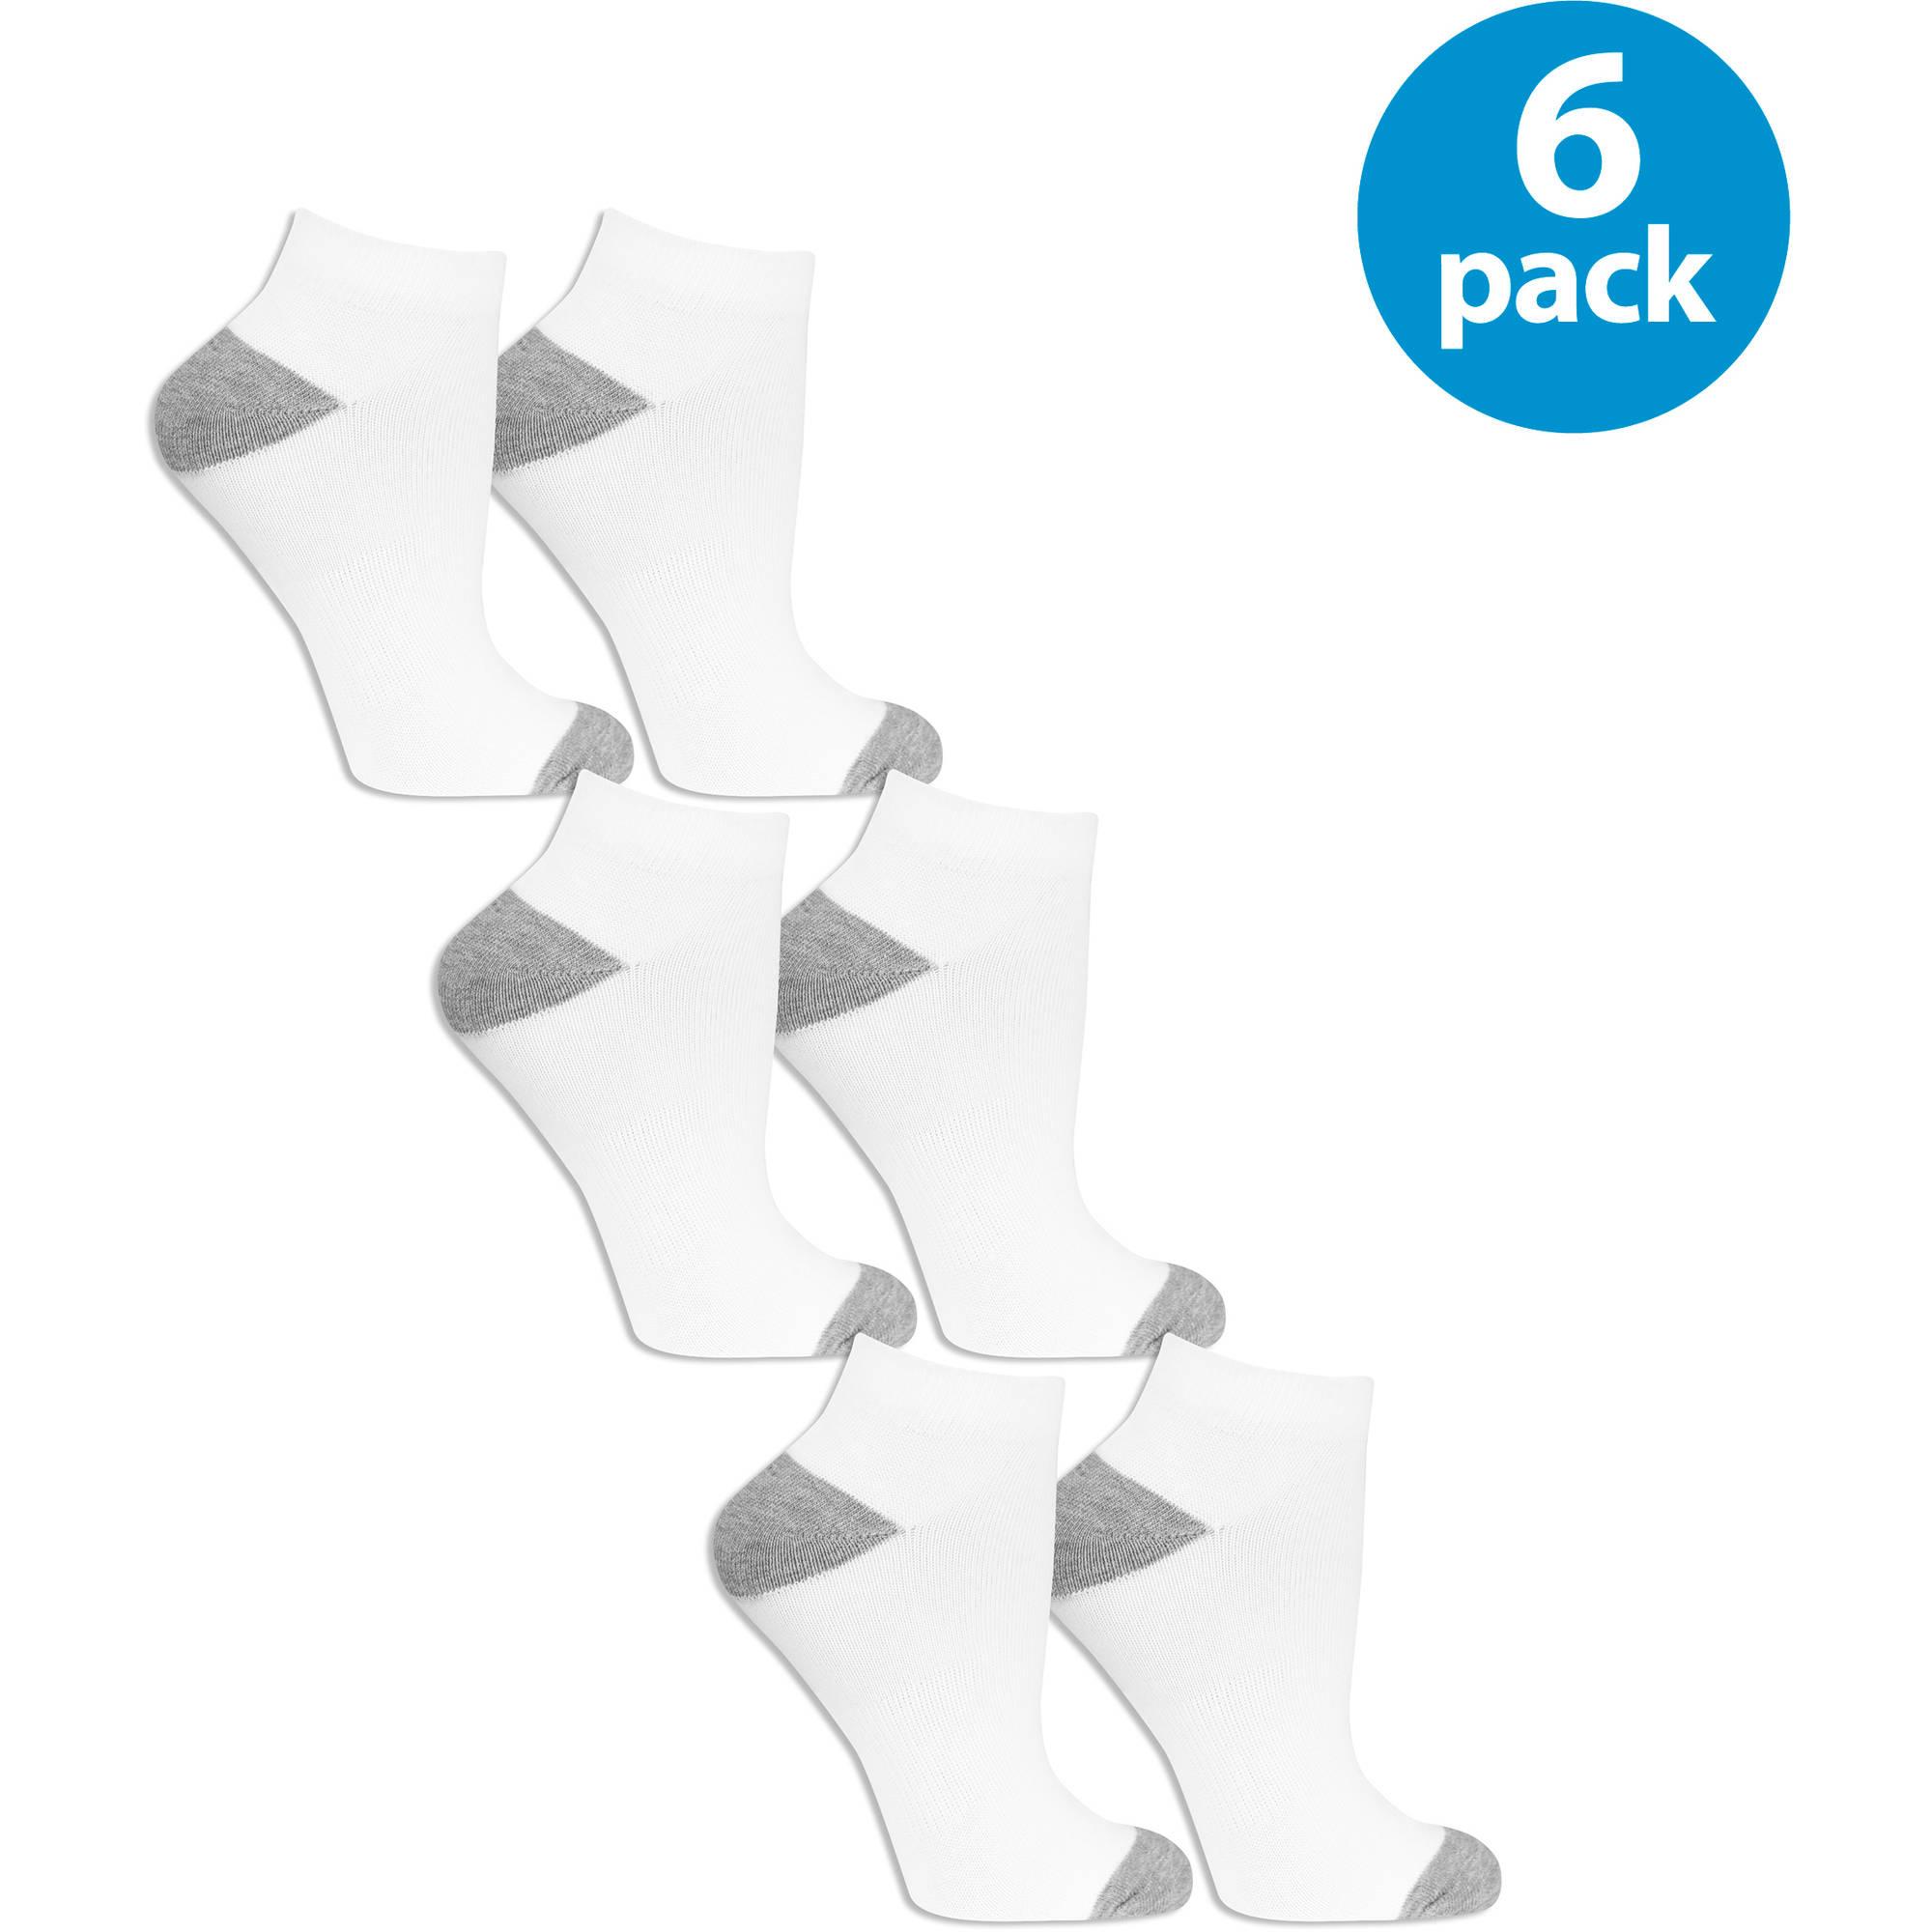 Fruit of the Loom Womens Value Pack Low Cut Socks, 6 Pairs